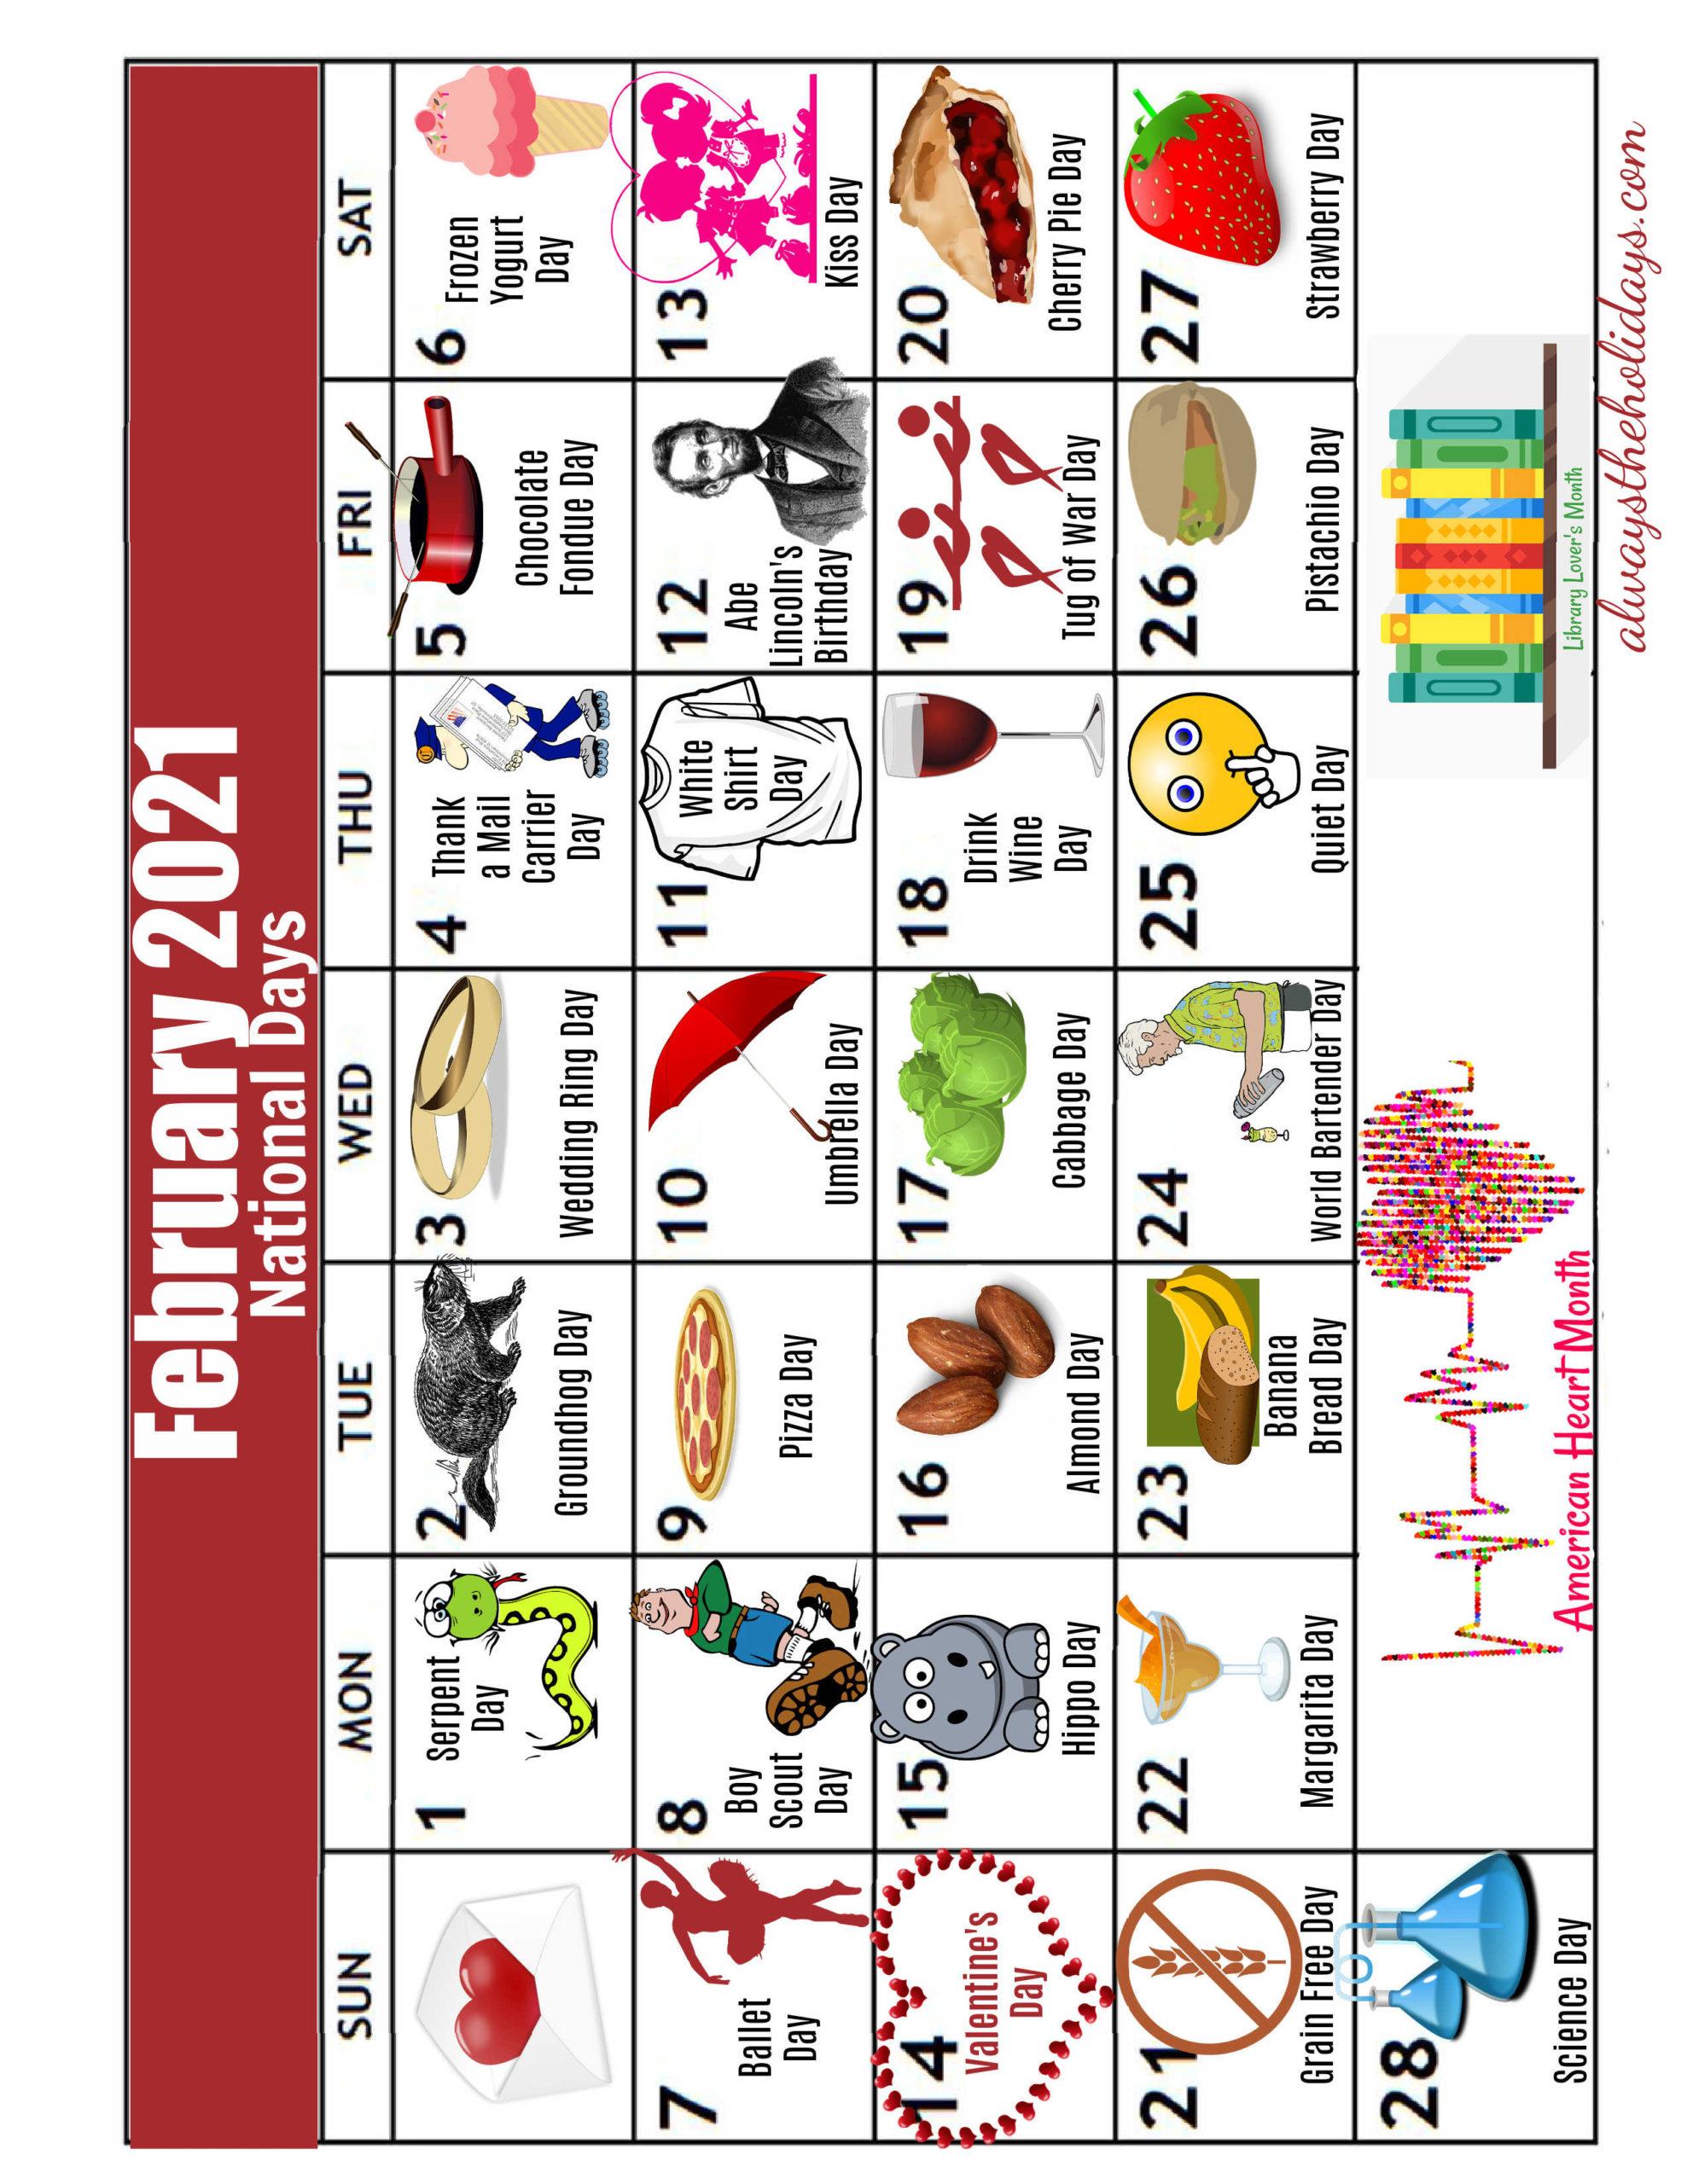 Calendar of National Days of February 2021 flipped sideways.